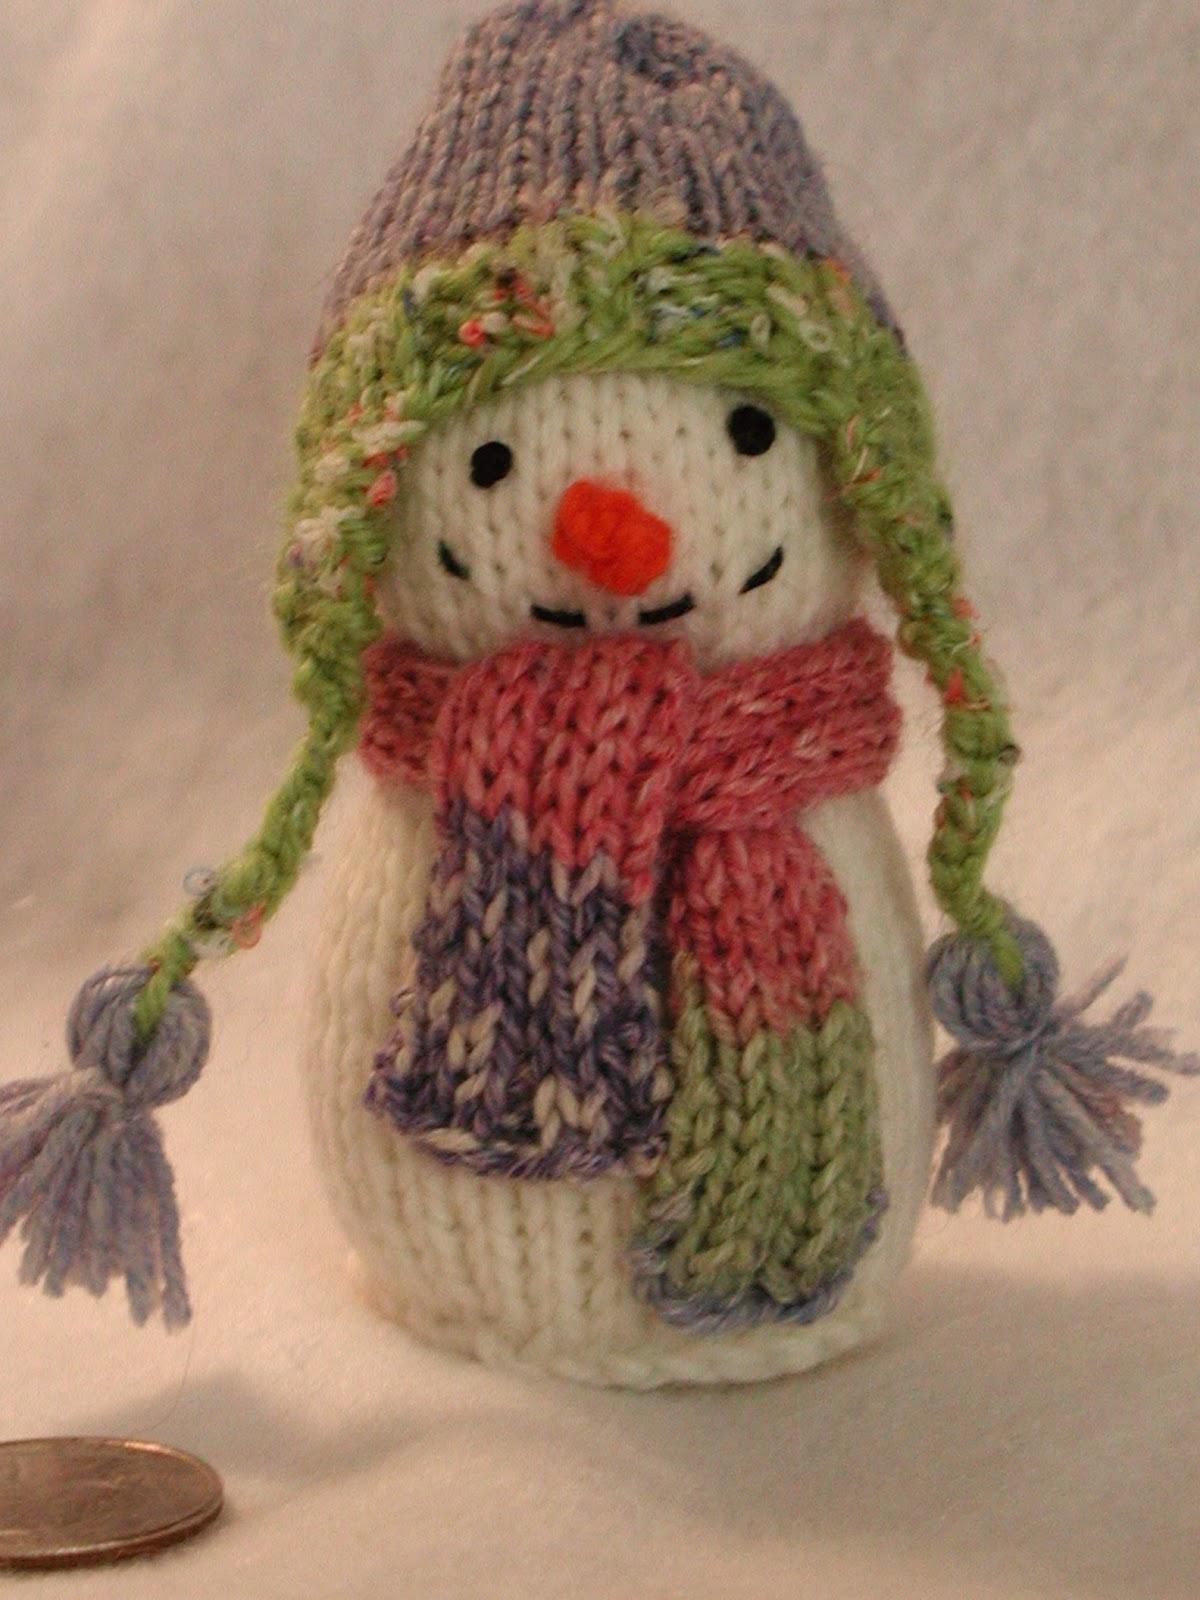 Fiddlesticks - My crochet and knitting ramblings.: More ...